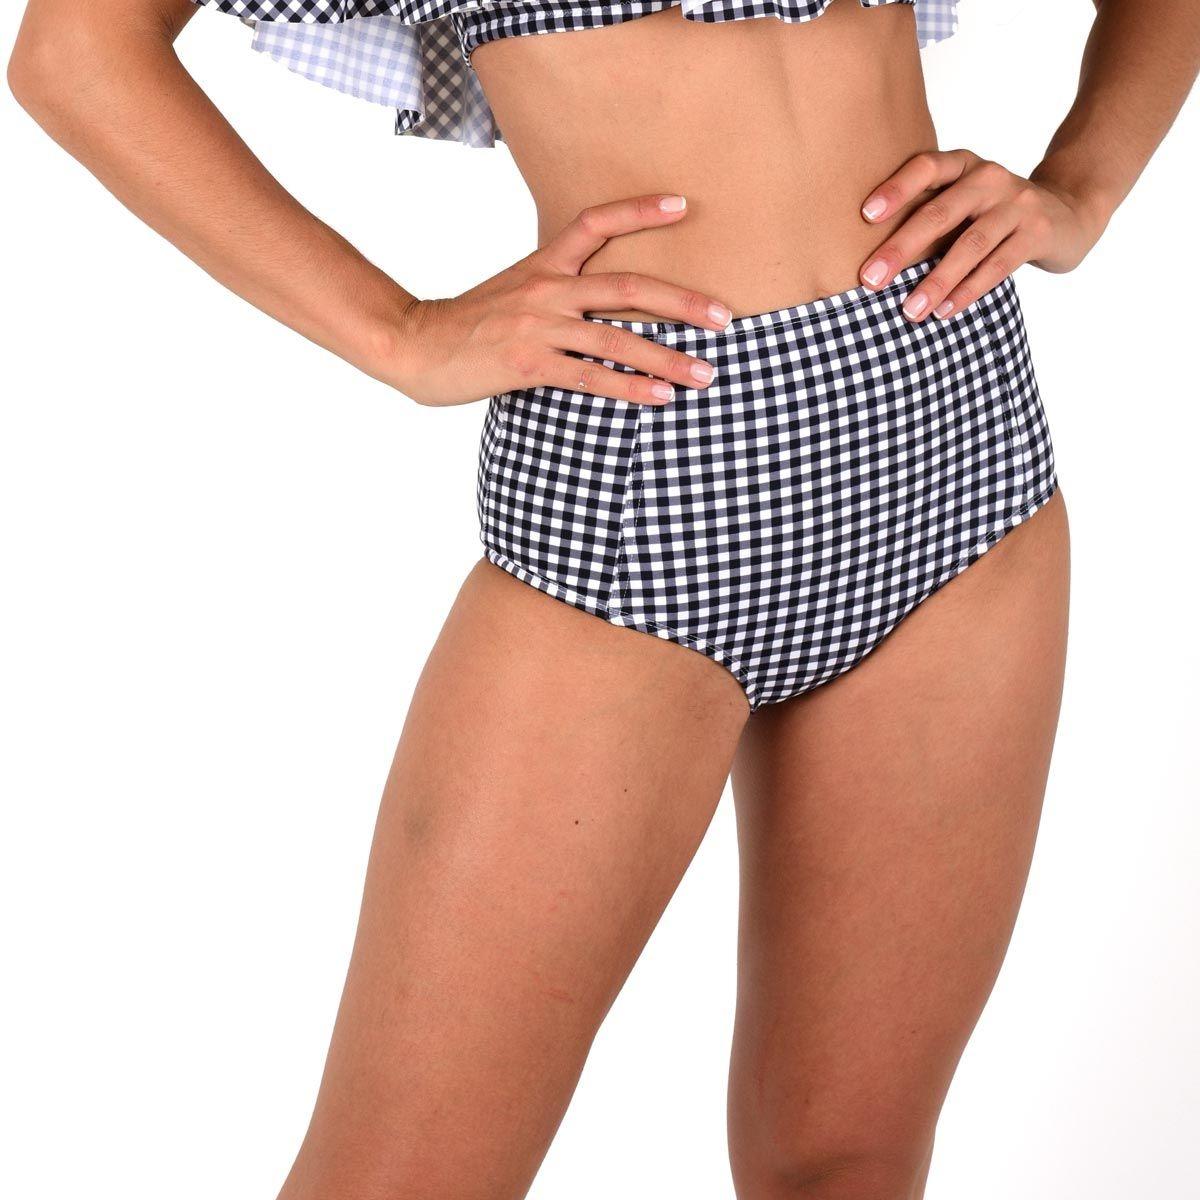 Ma Culotte Taille Haute imprimé vichy (Bas)